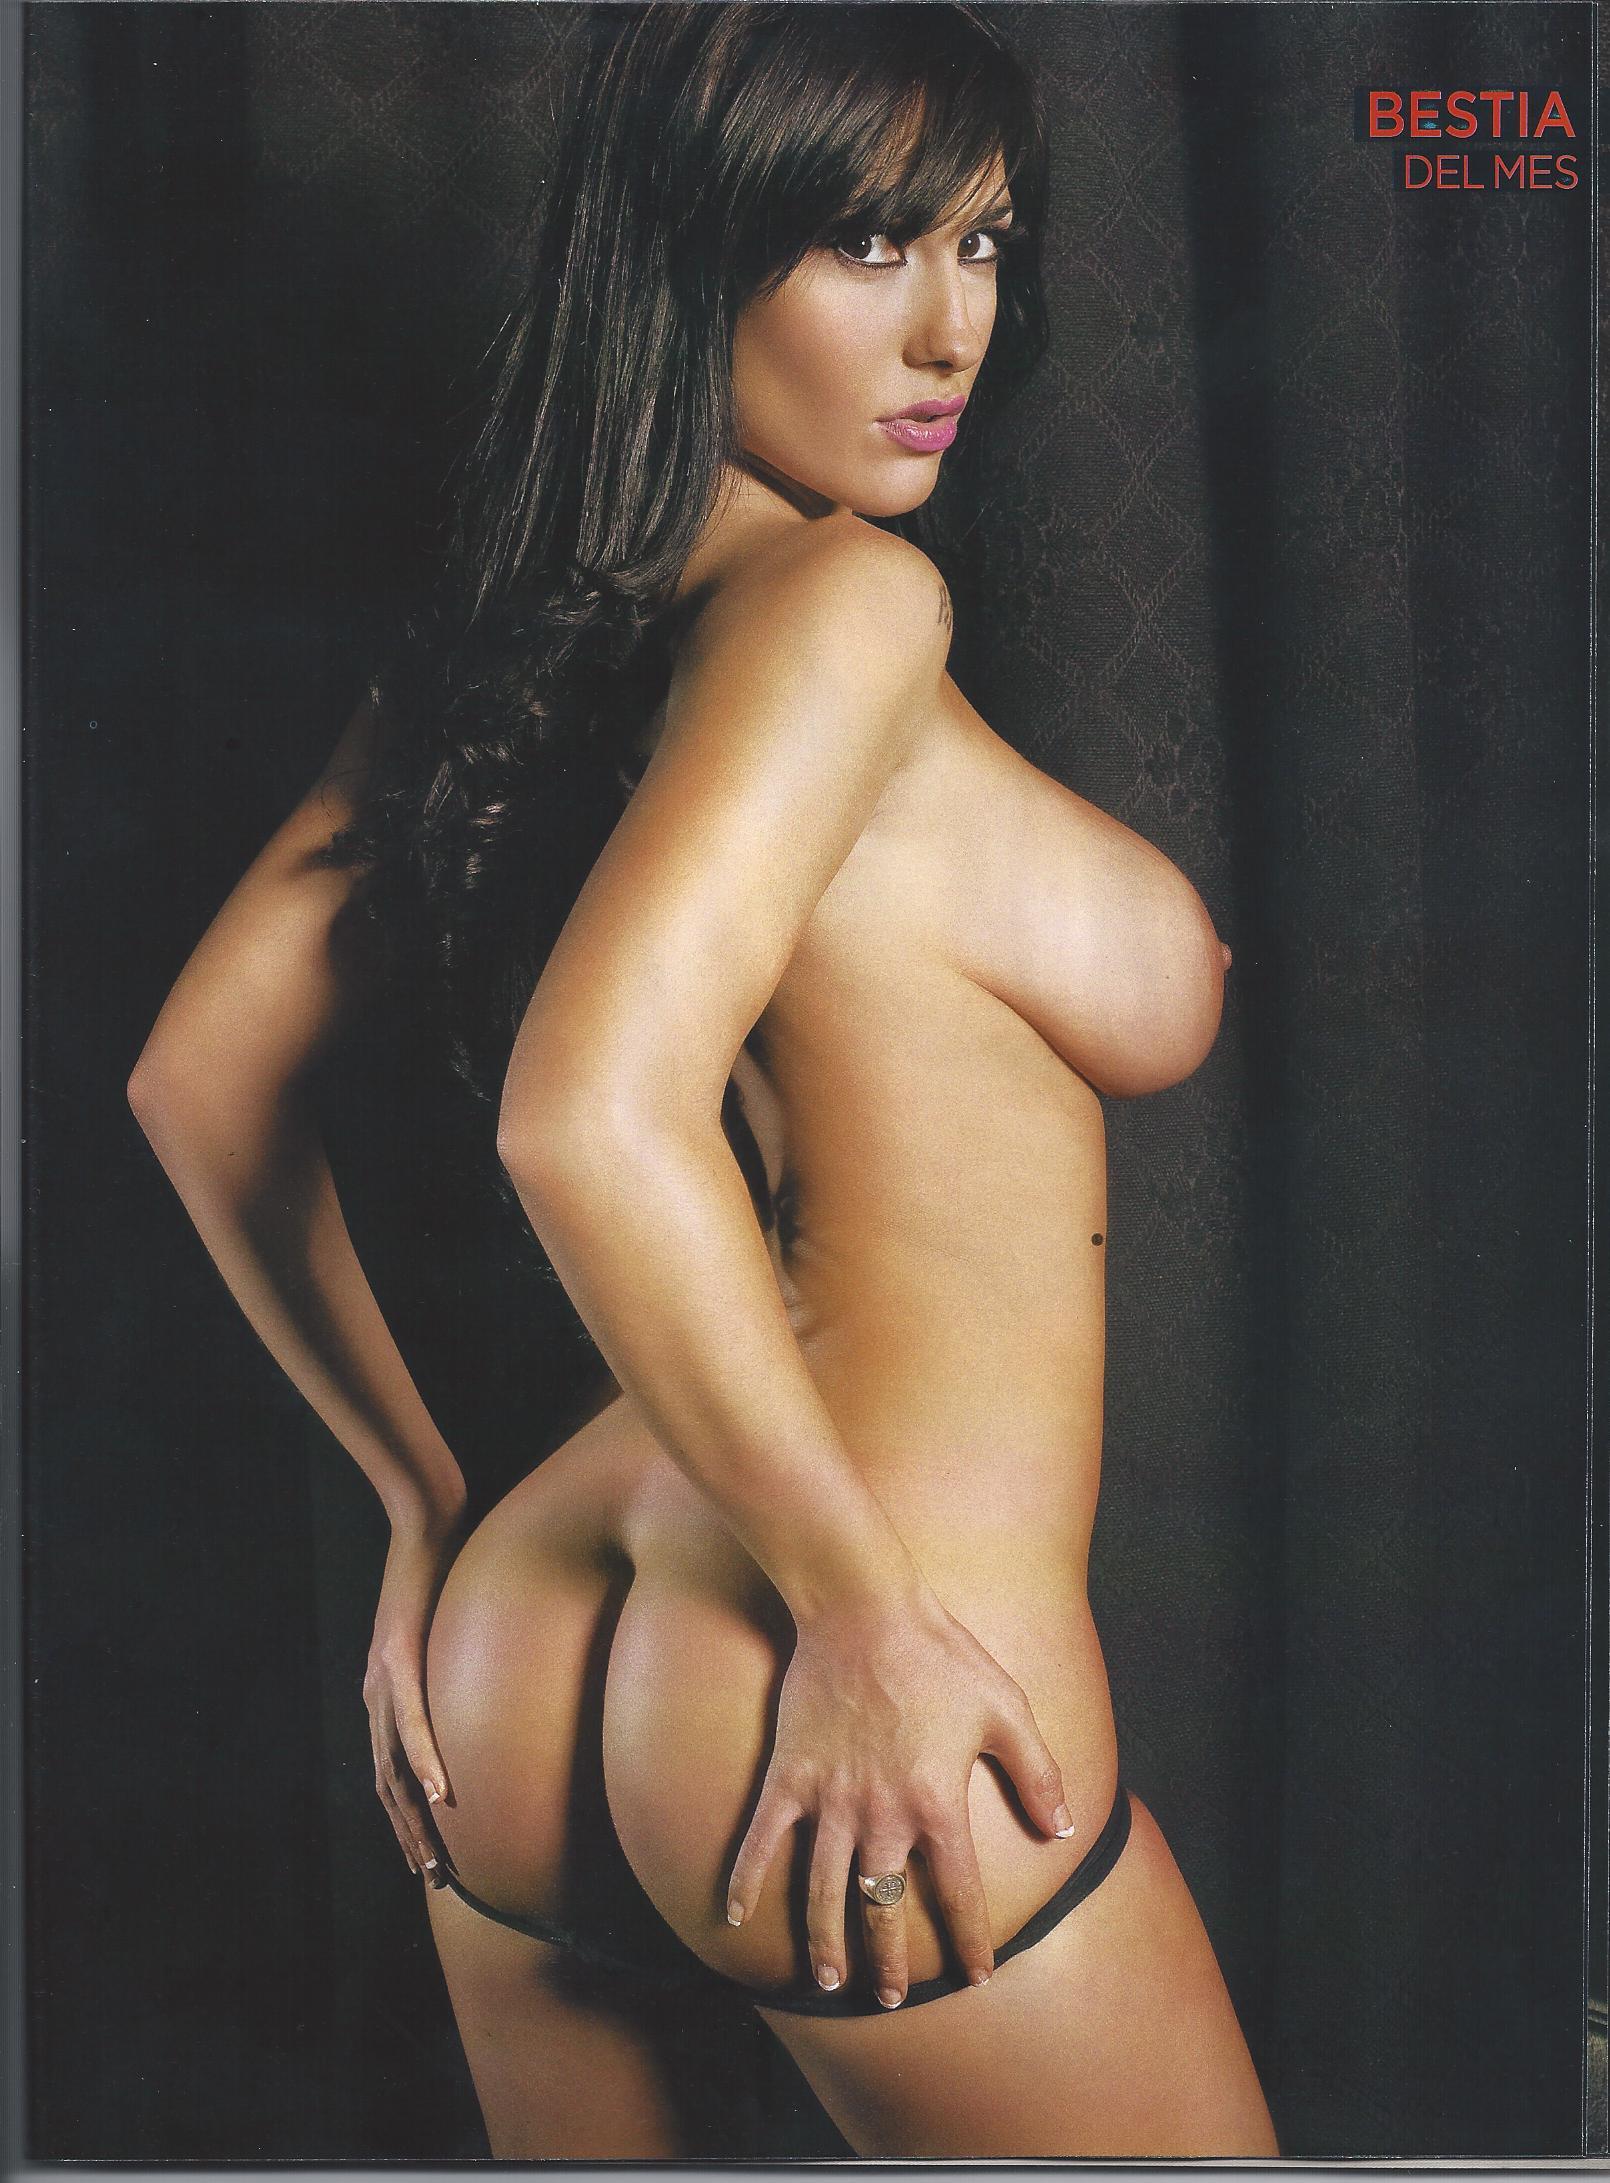 king magazine girls nude